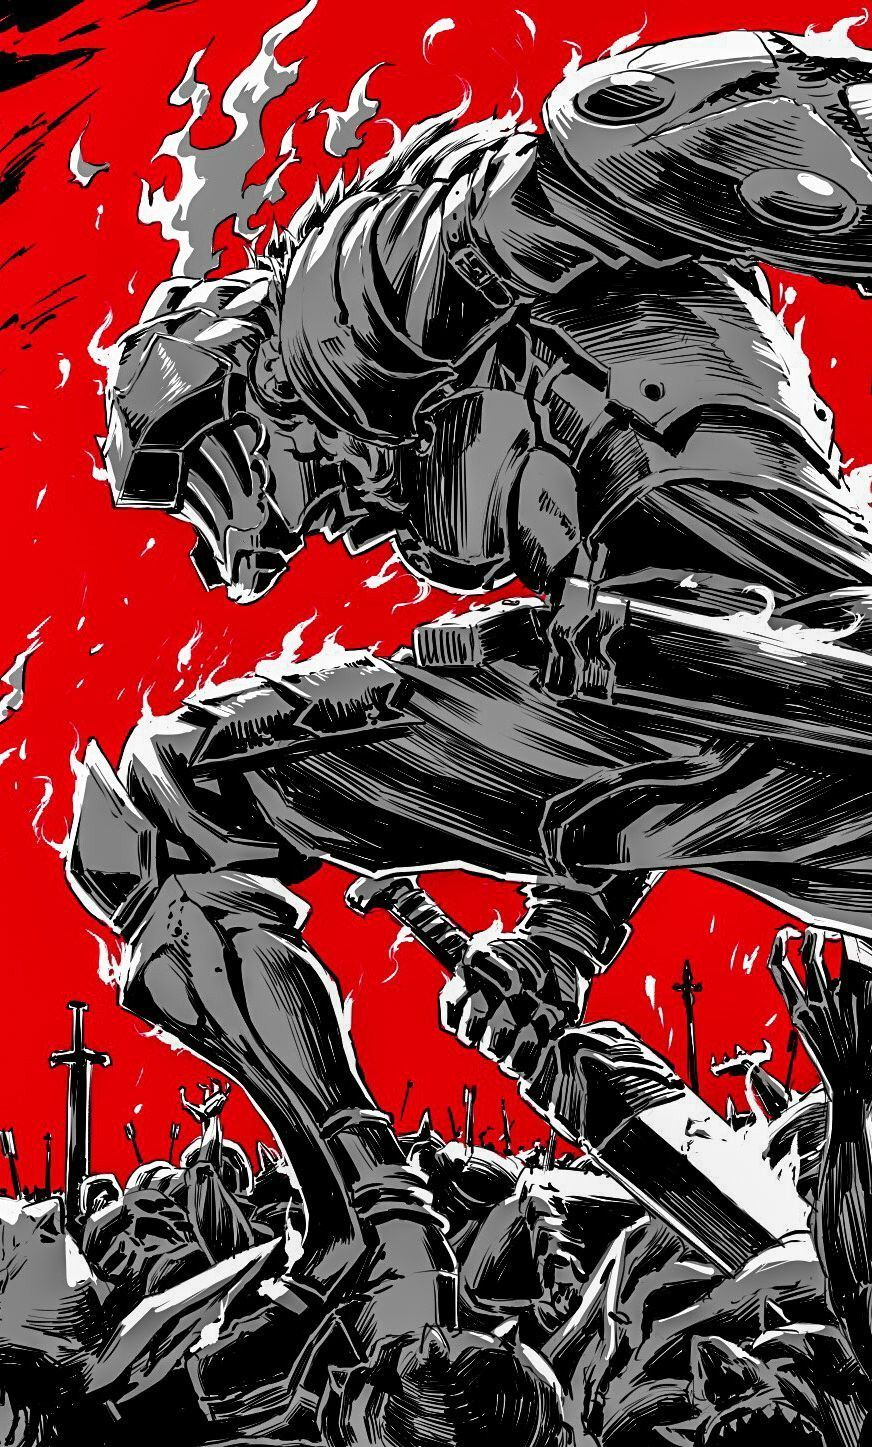 Goblin Slayer in 2020 Slayer anime, Goblin, Slayer